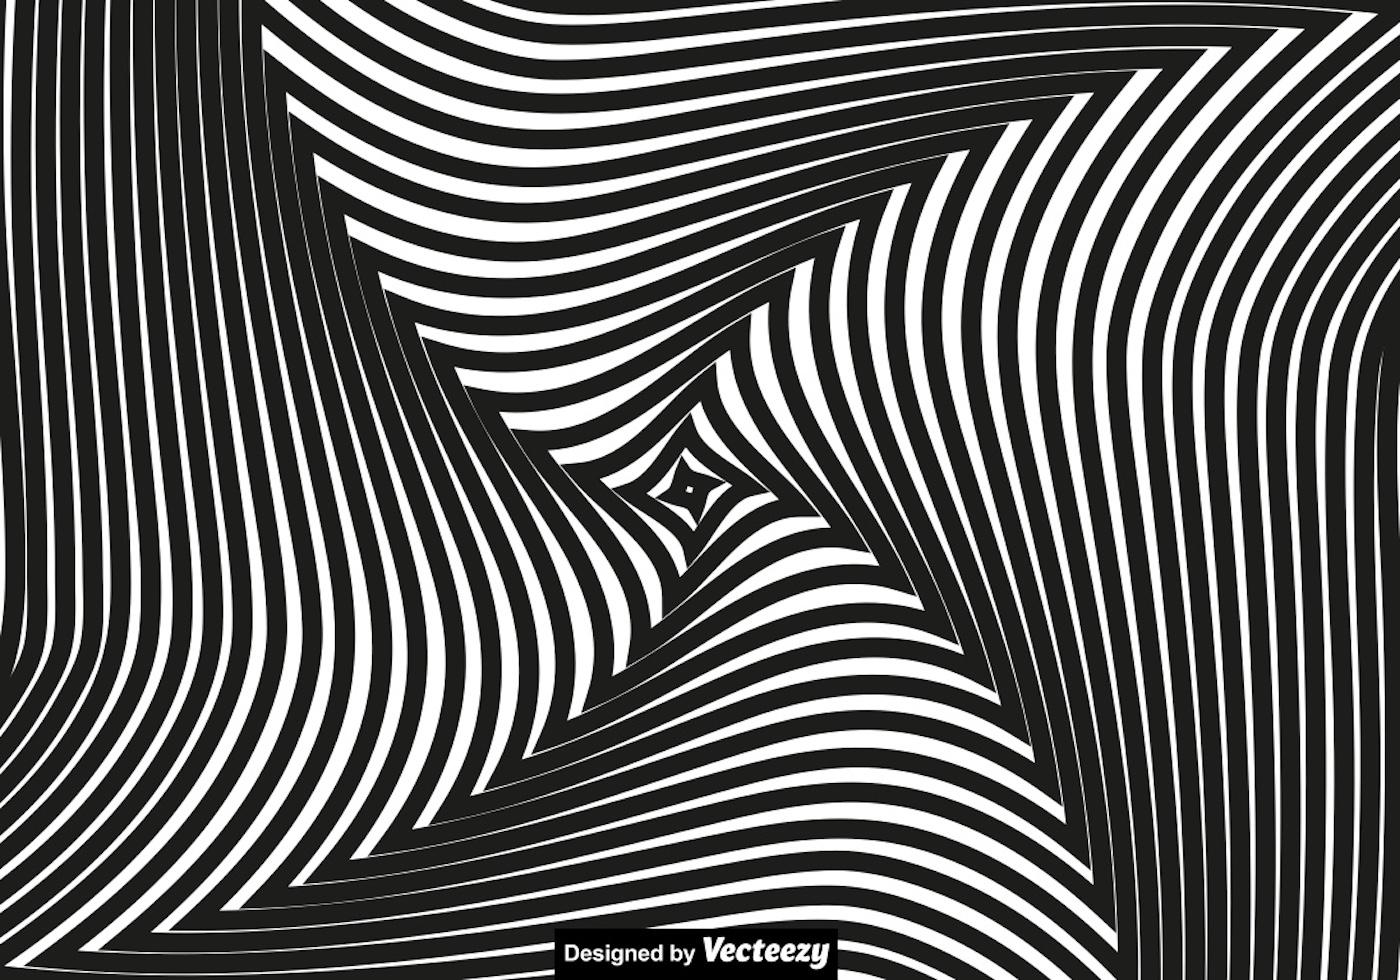 Erotic hypnosis download